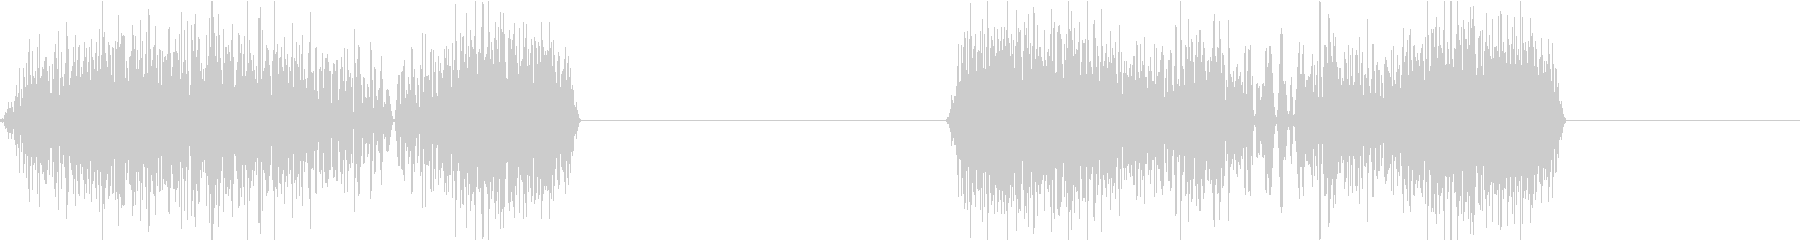 DJプレイ スクラッチ・ノイズ 108の未再生の波形